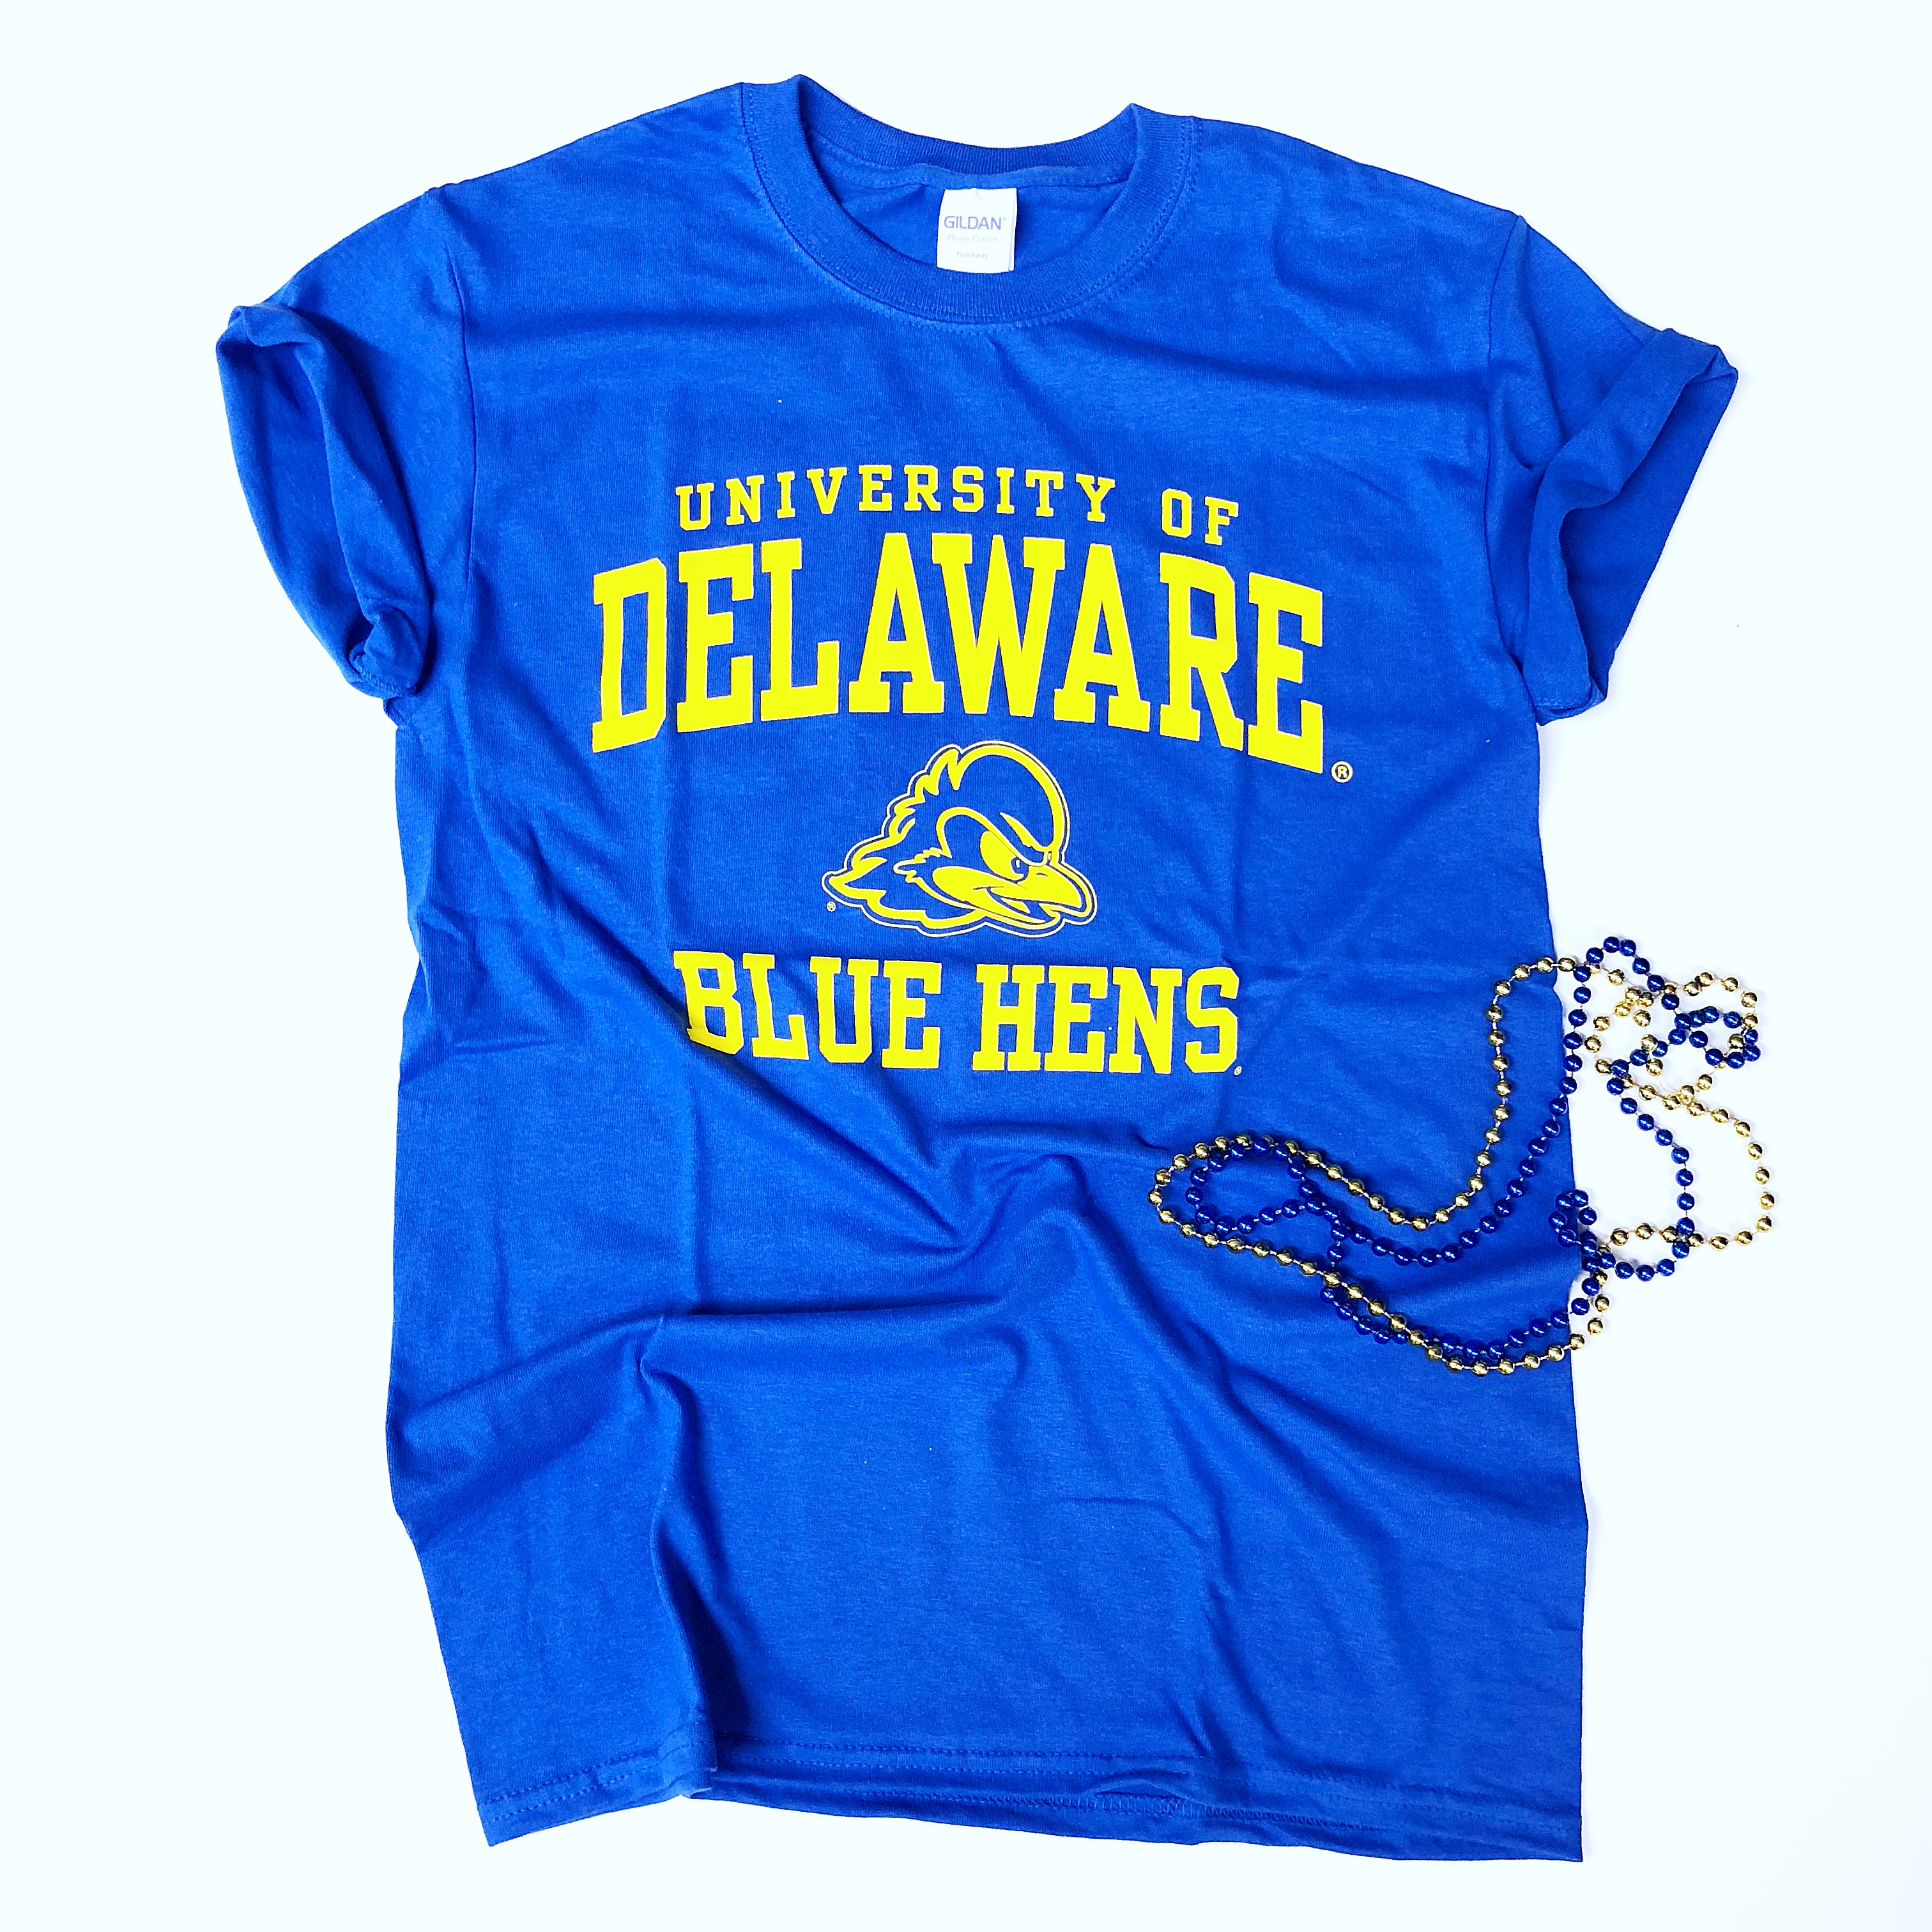 sale retailer 85661 b737b University of Delaware Blue Hens T-shirt - Blue